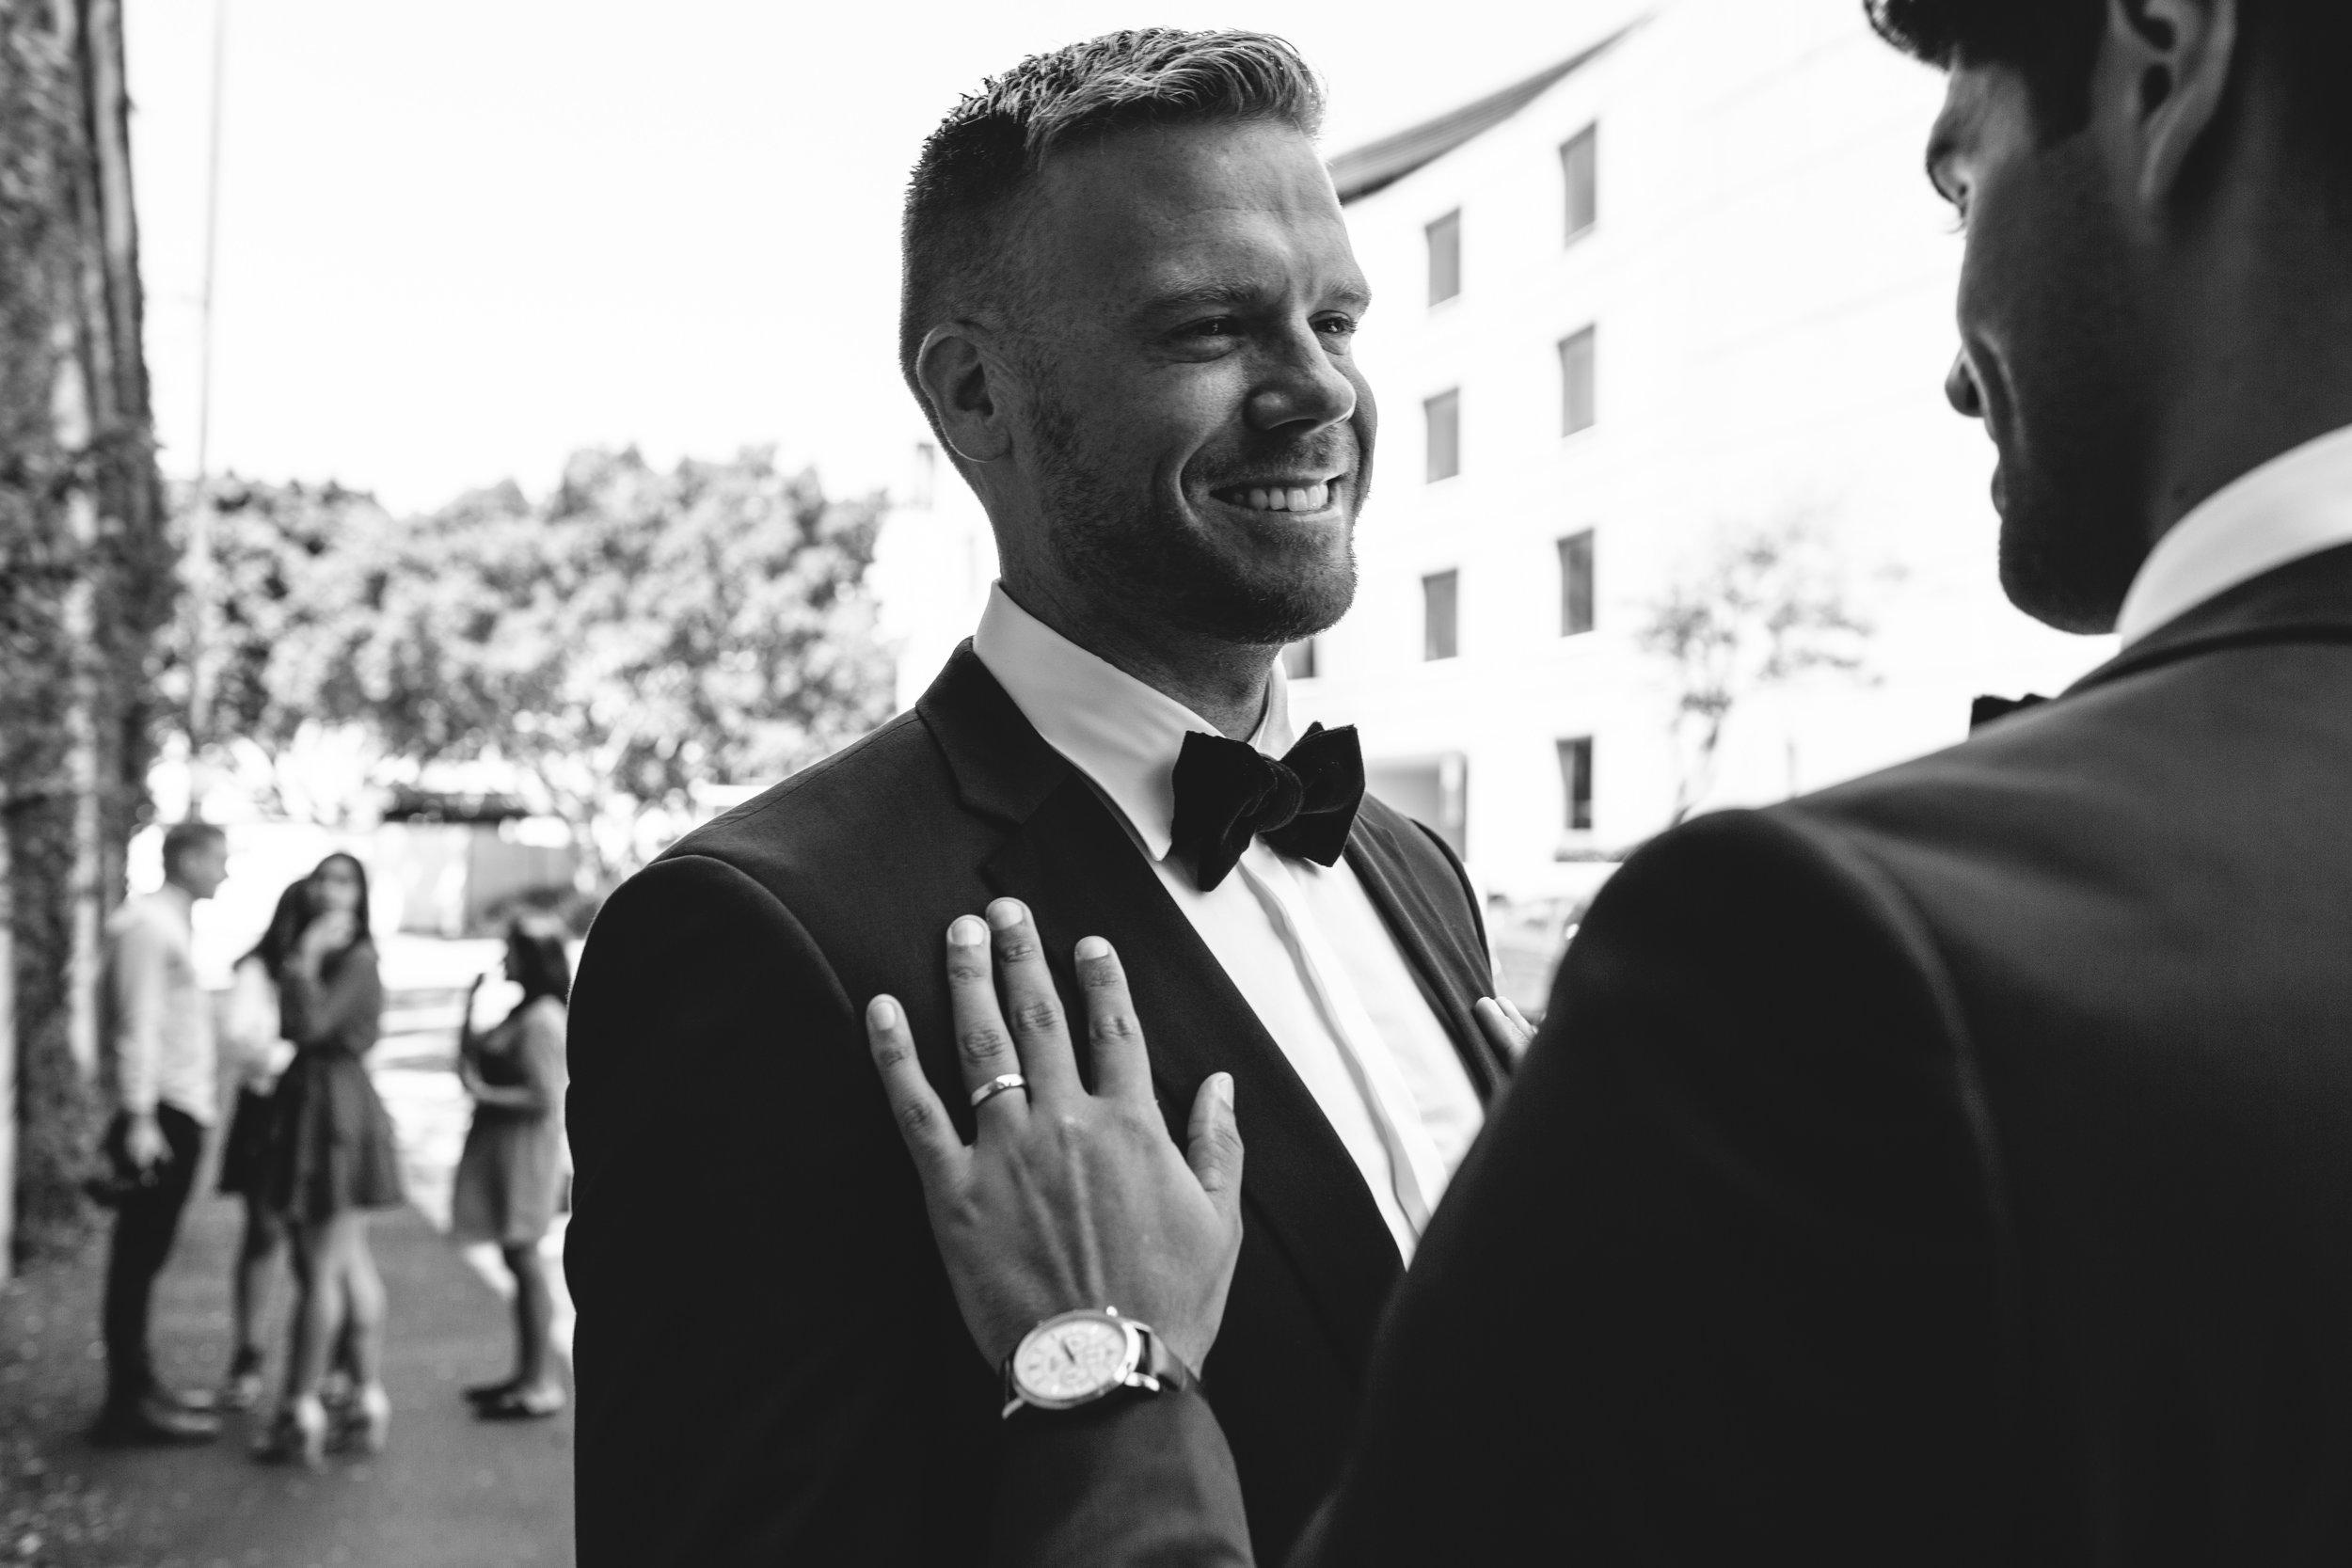 Stephen&David-Wedding-9.jpg